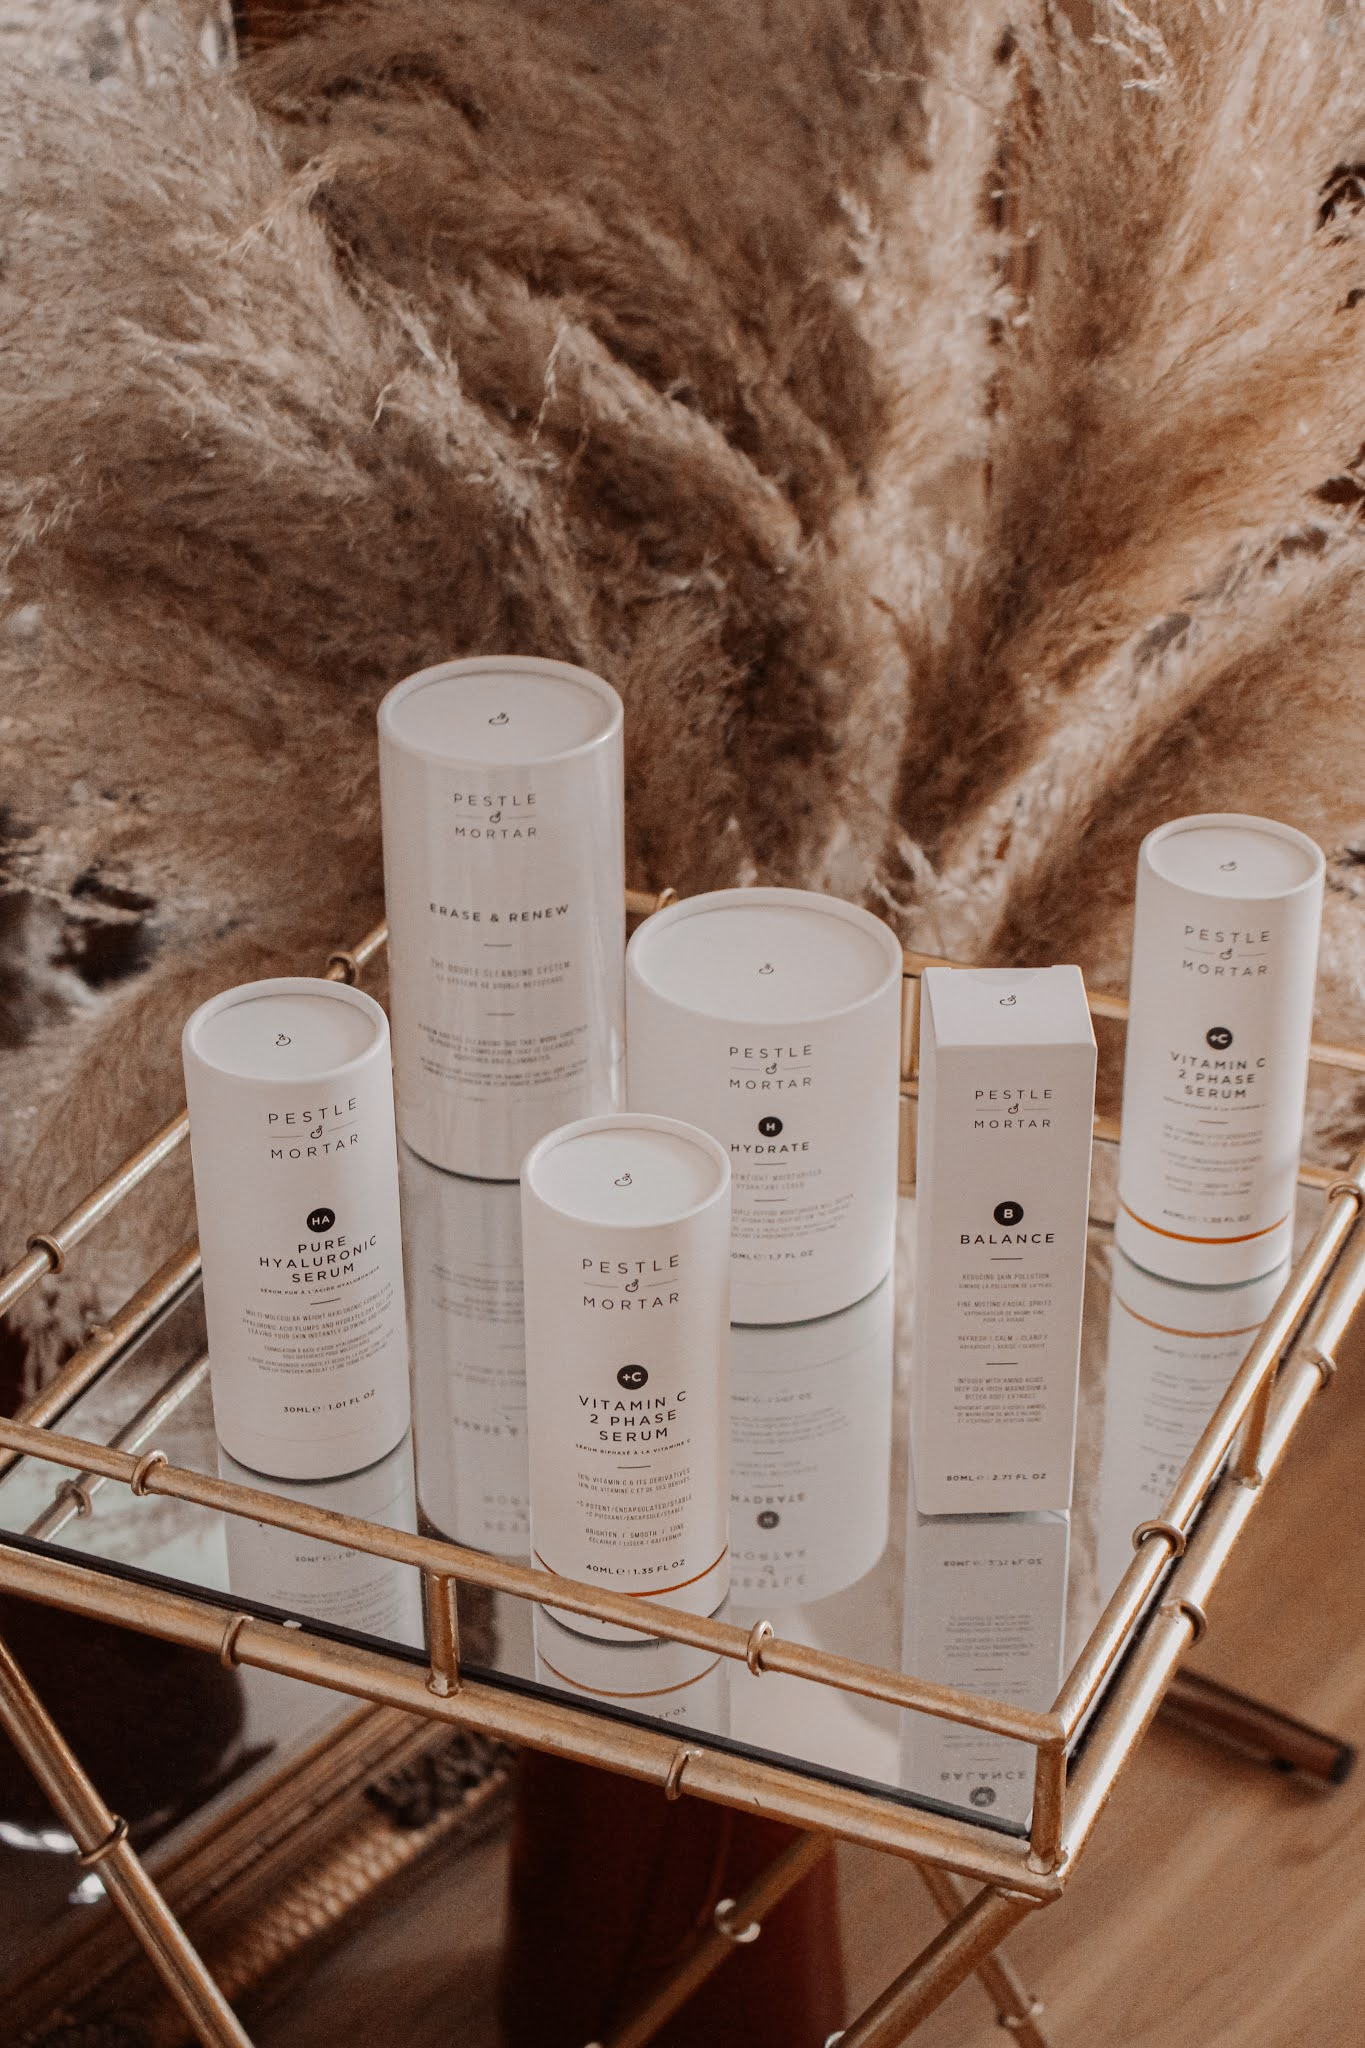 Pestle & Mortar Skincare 2021 Beauty Blog Review